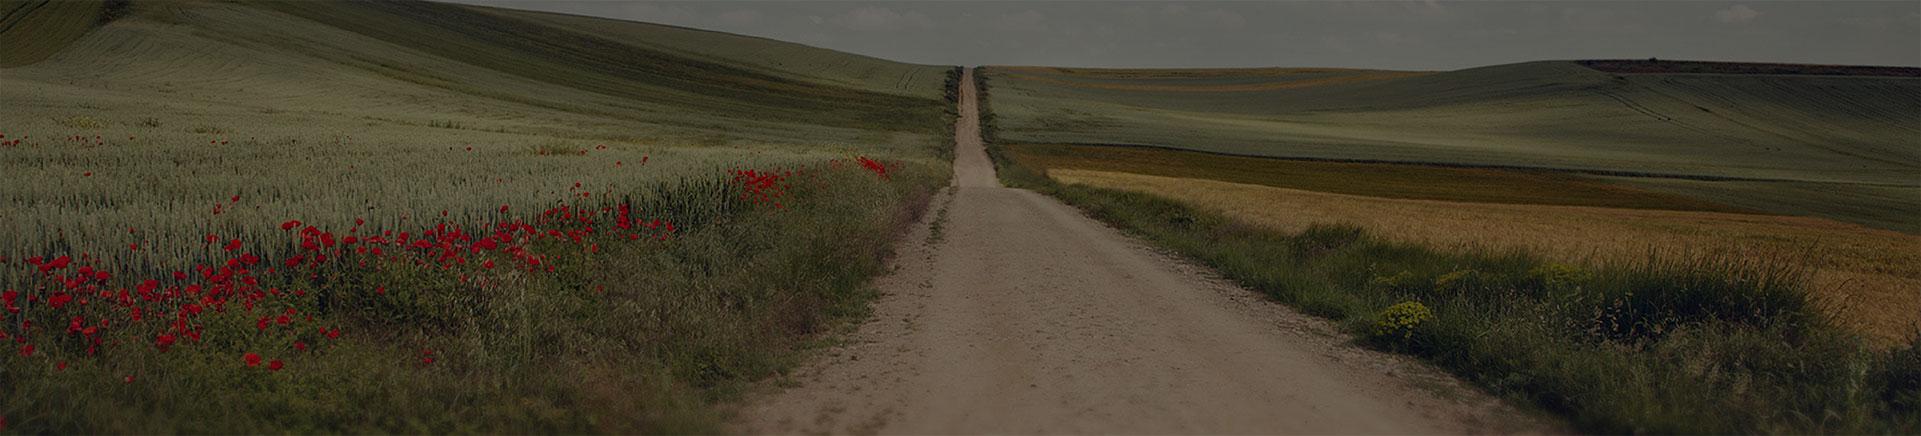 Camino Francés (The French Way)